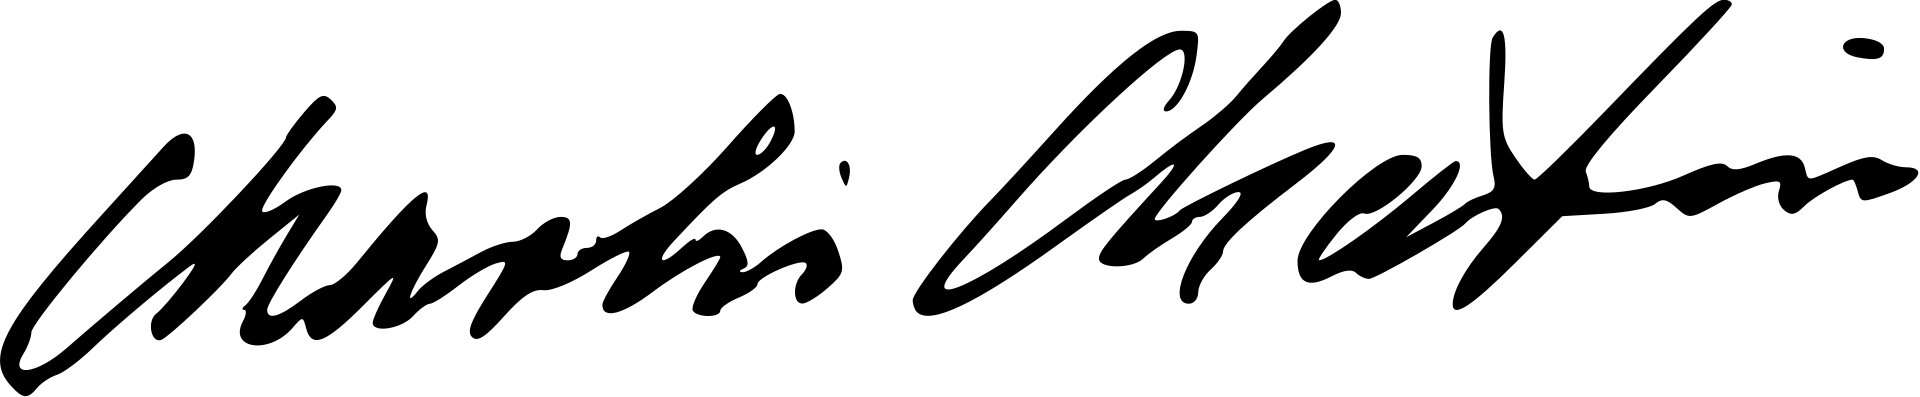 Charlie Spencer Chaplin Signature